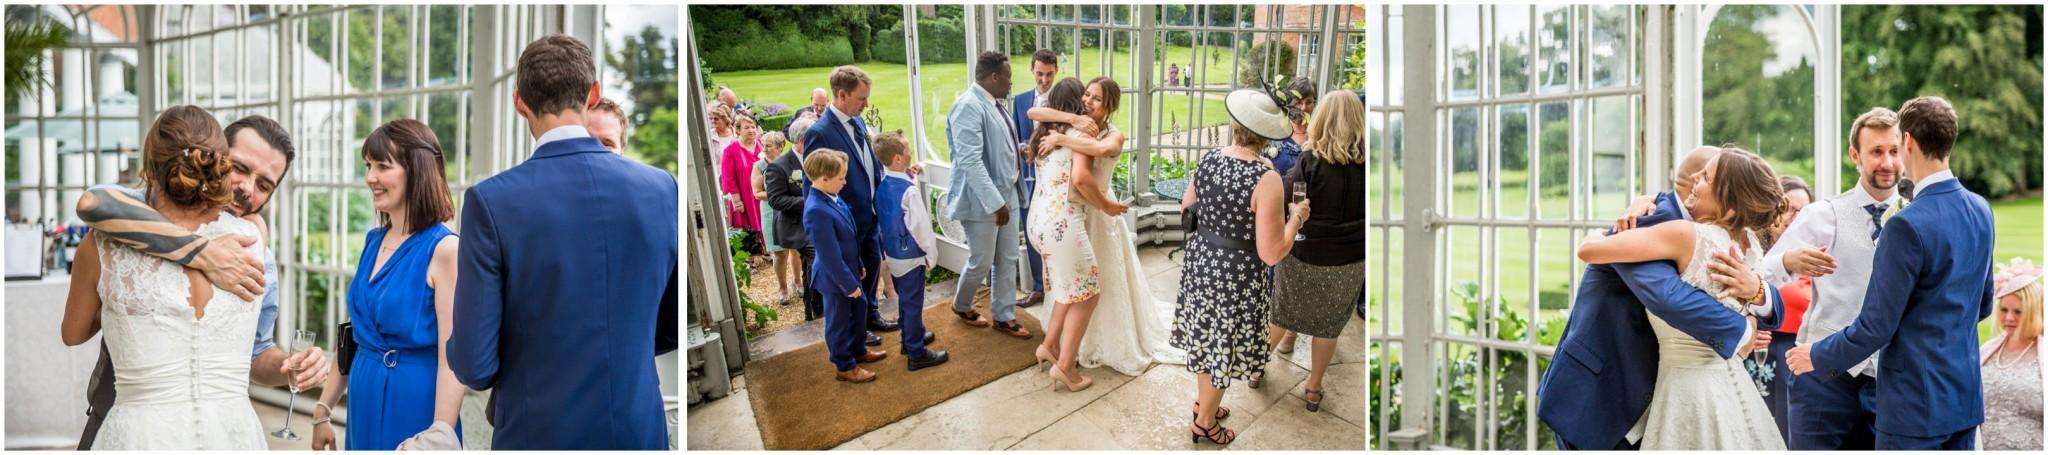 Avington Park Wedding Bride & Groom Before the Wedding Breakfast